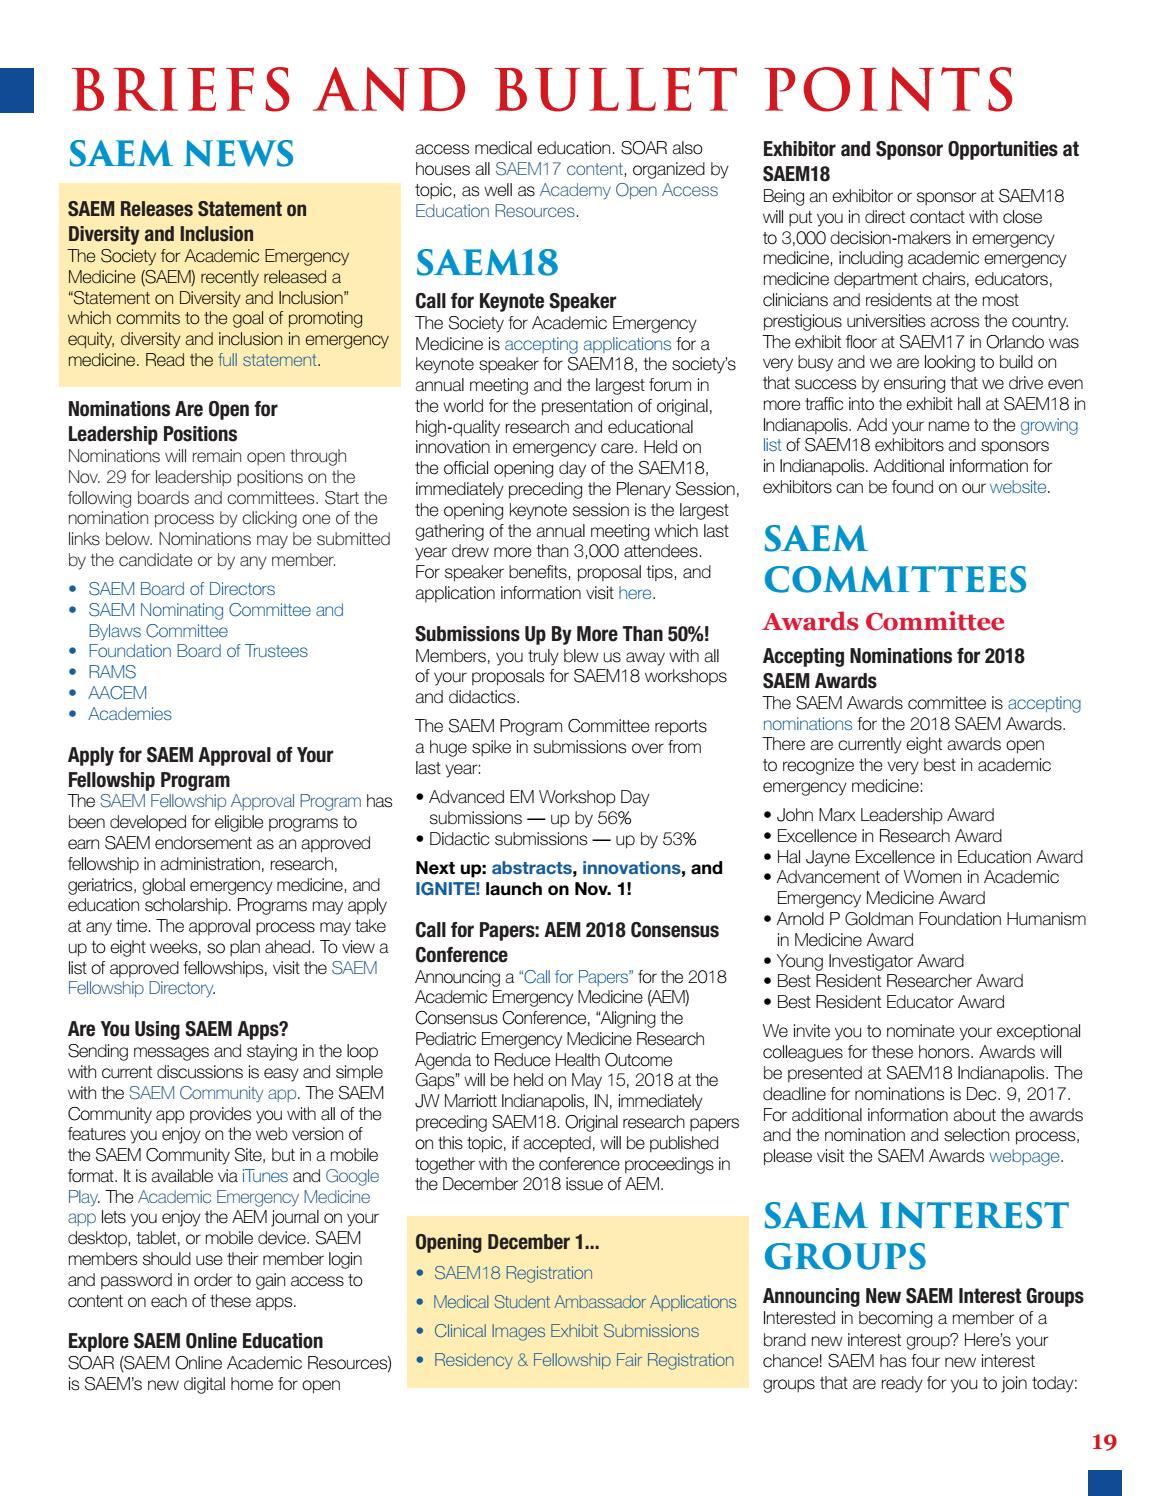 SAEM PULSE November–December 2017 by Society for Academic